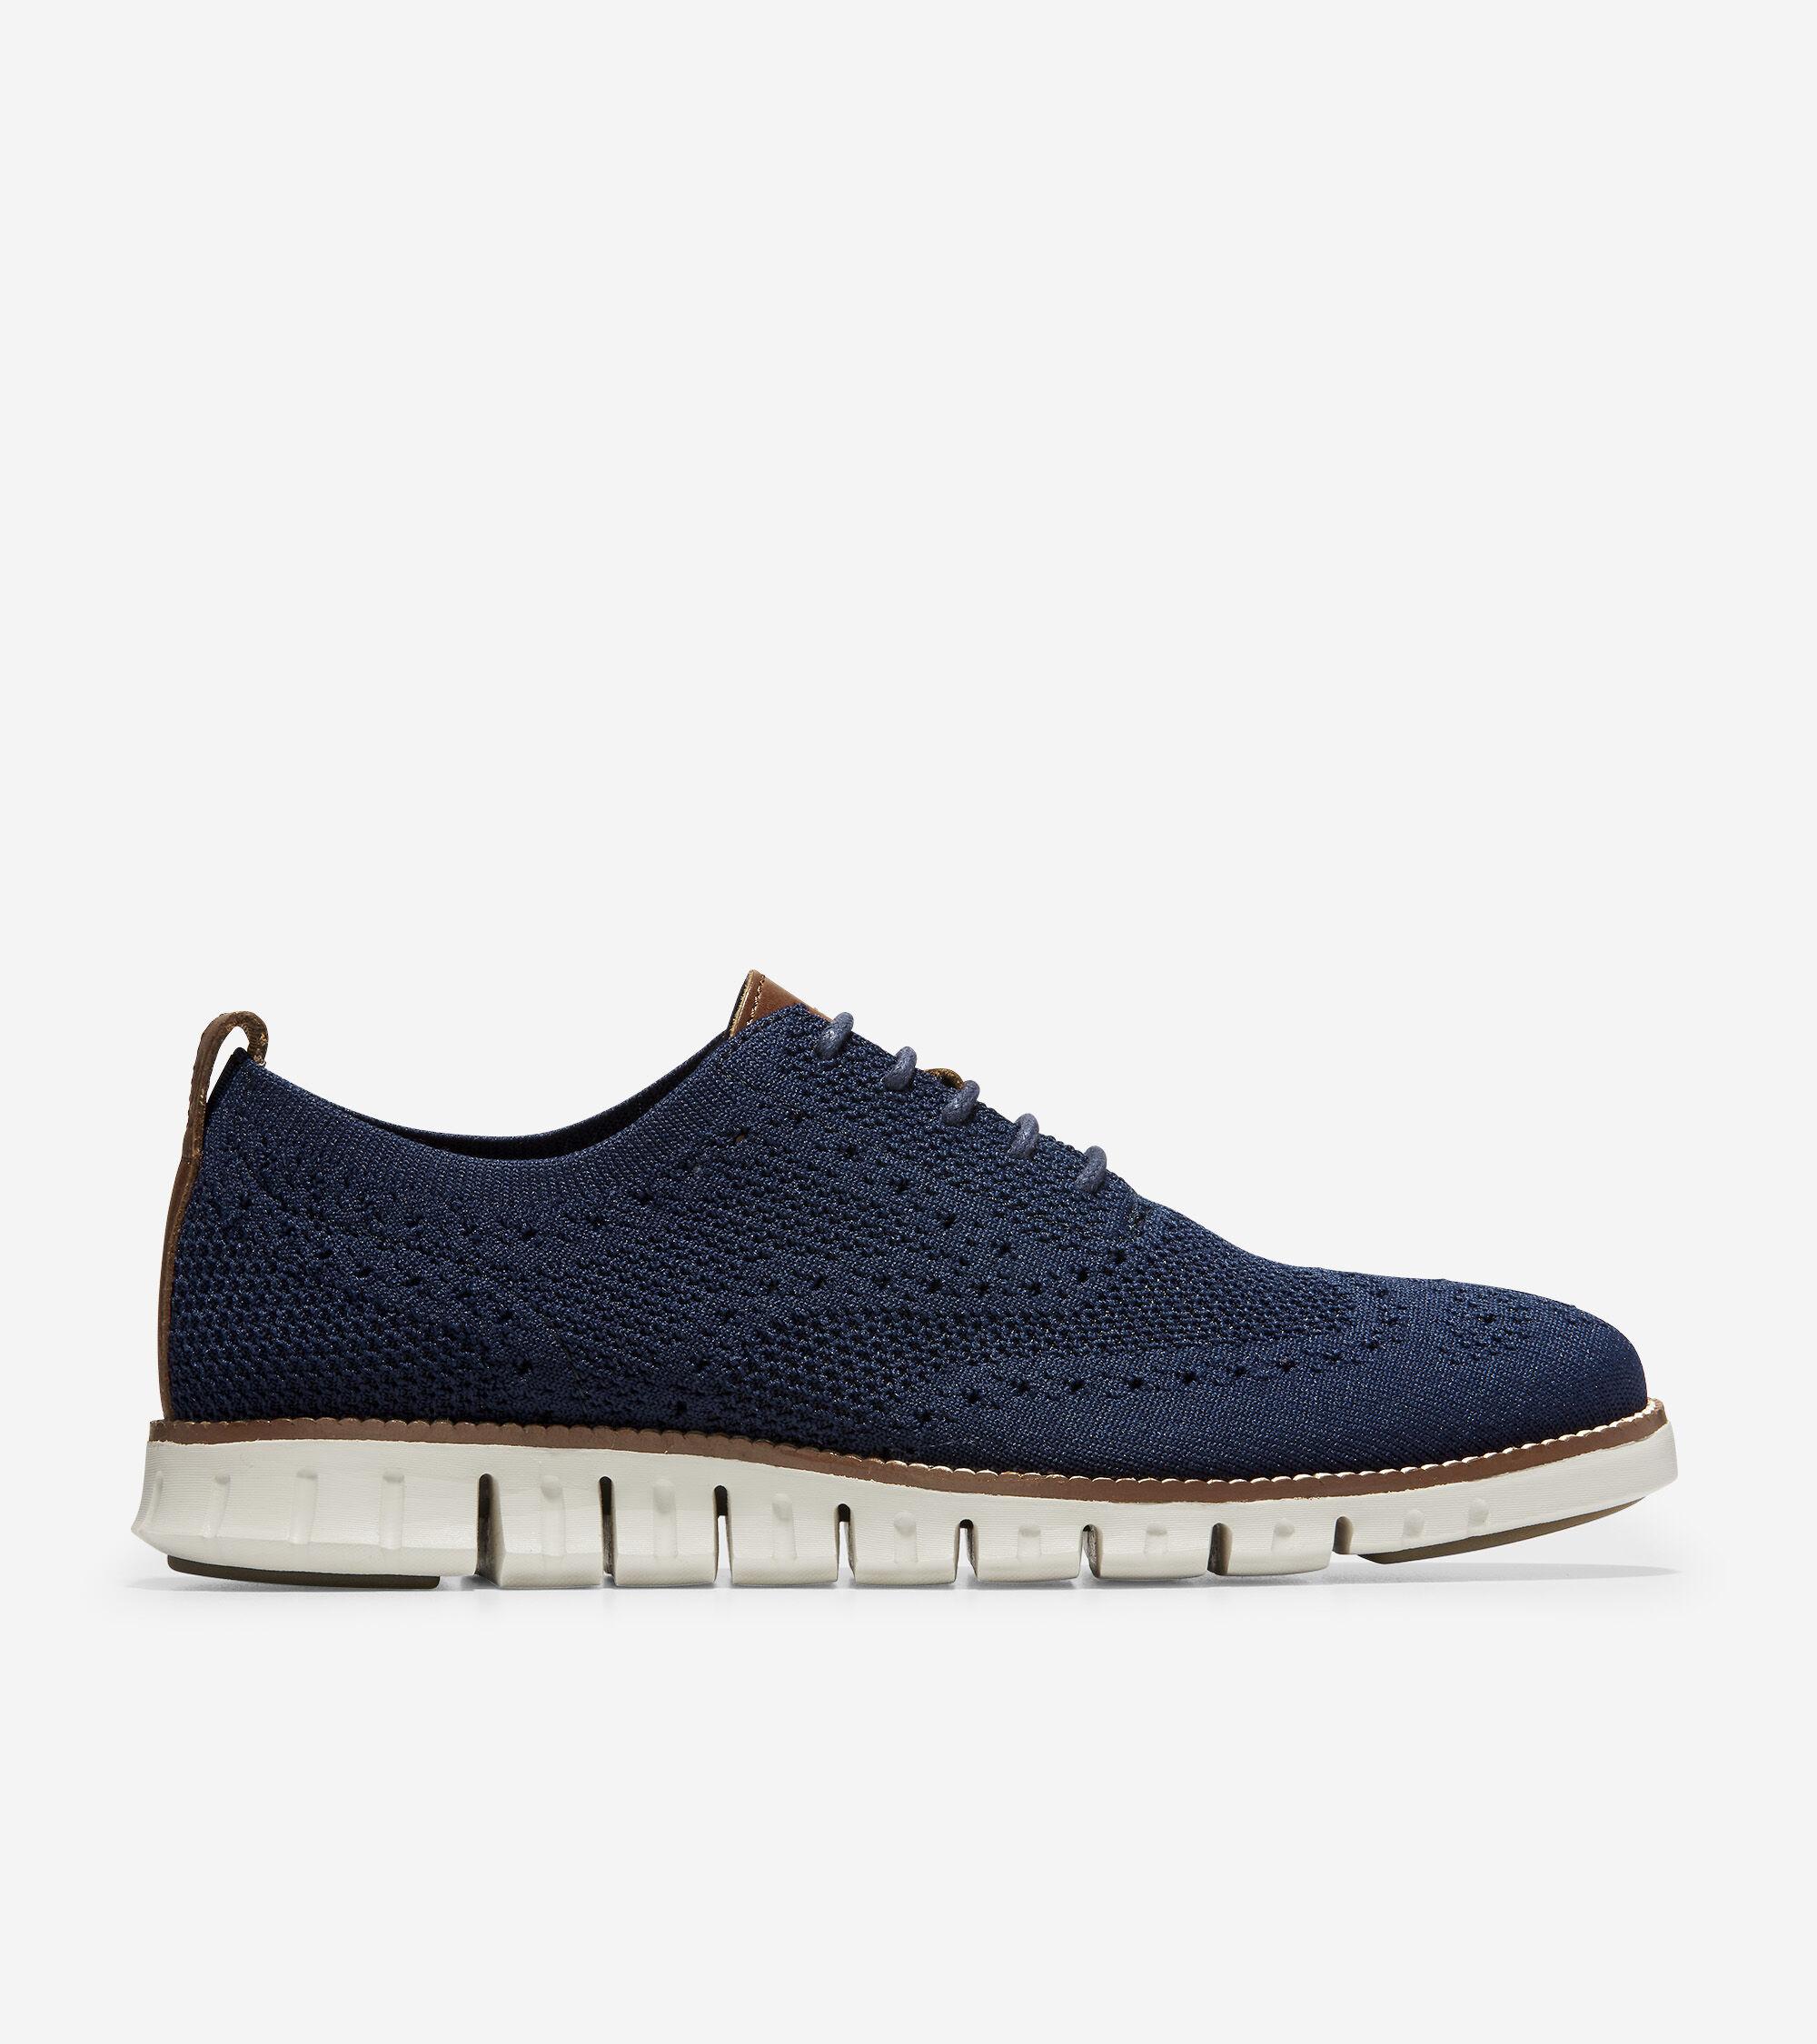 Men's ZEROGRAND Shoes, Bags \u0026 Outerwear